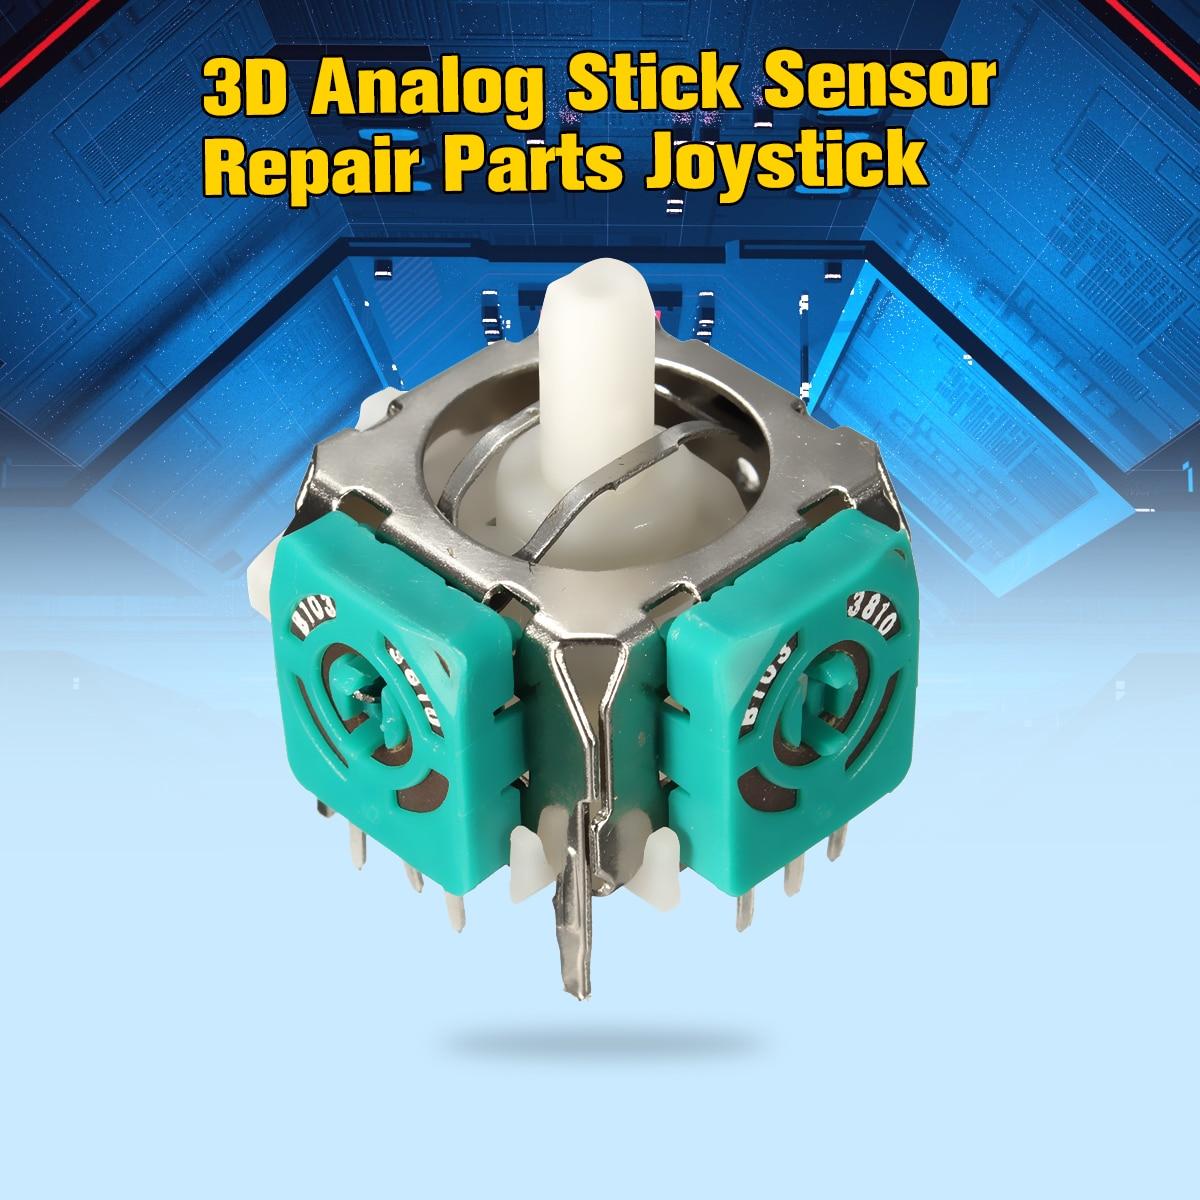 3D Analog Joystick Stick Potentiometer Module Sensor Repair Parts For Microsoft For Xbox 360/PS2 Controller Joystick Cheap 3D Analog Joystick Stick Potentiometer Module Sensor Repair Parts For Microsoft For Xbox 360/PS2 Controller Joystick Cheap